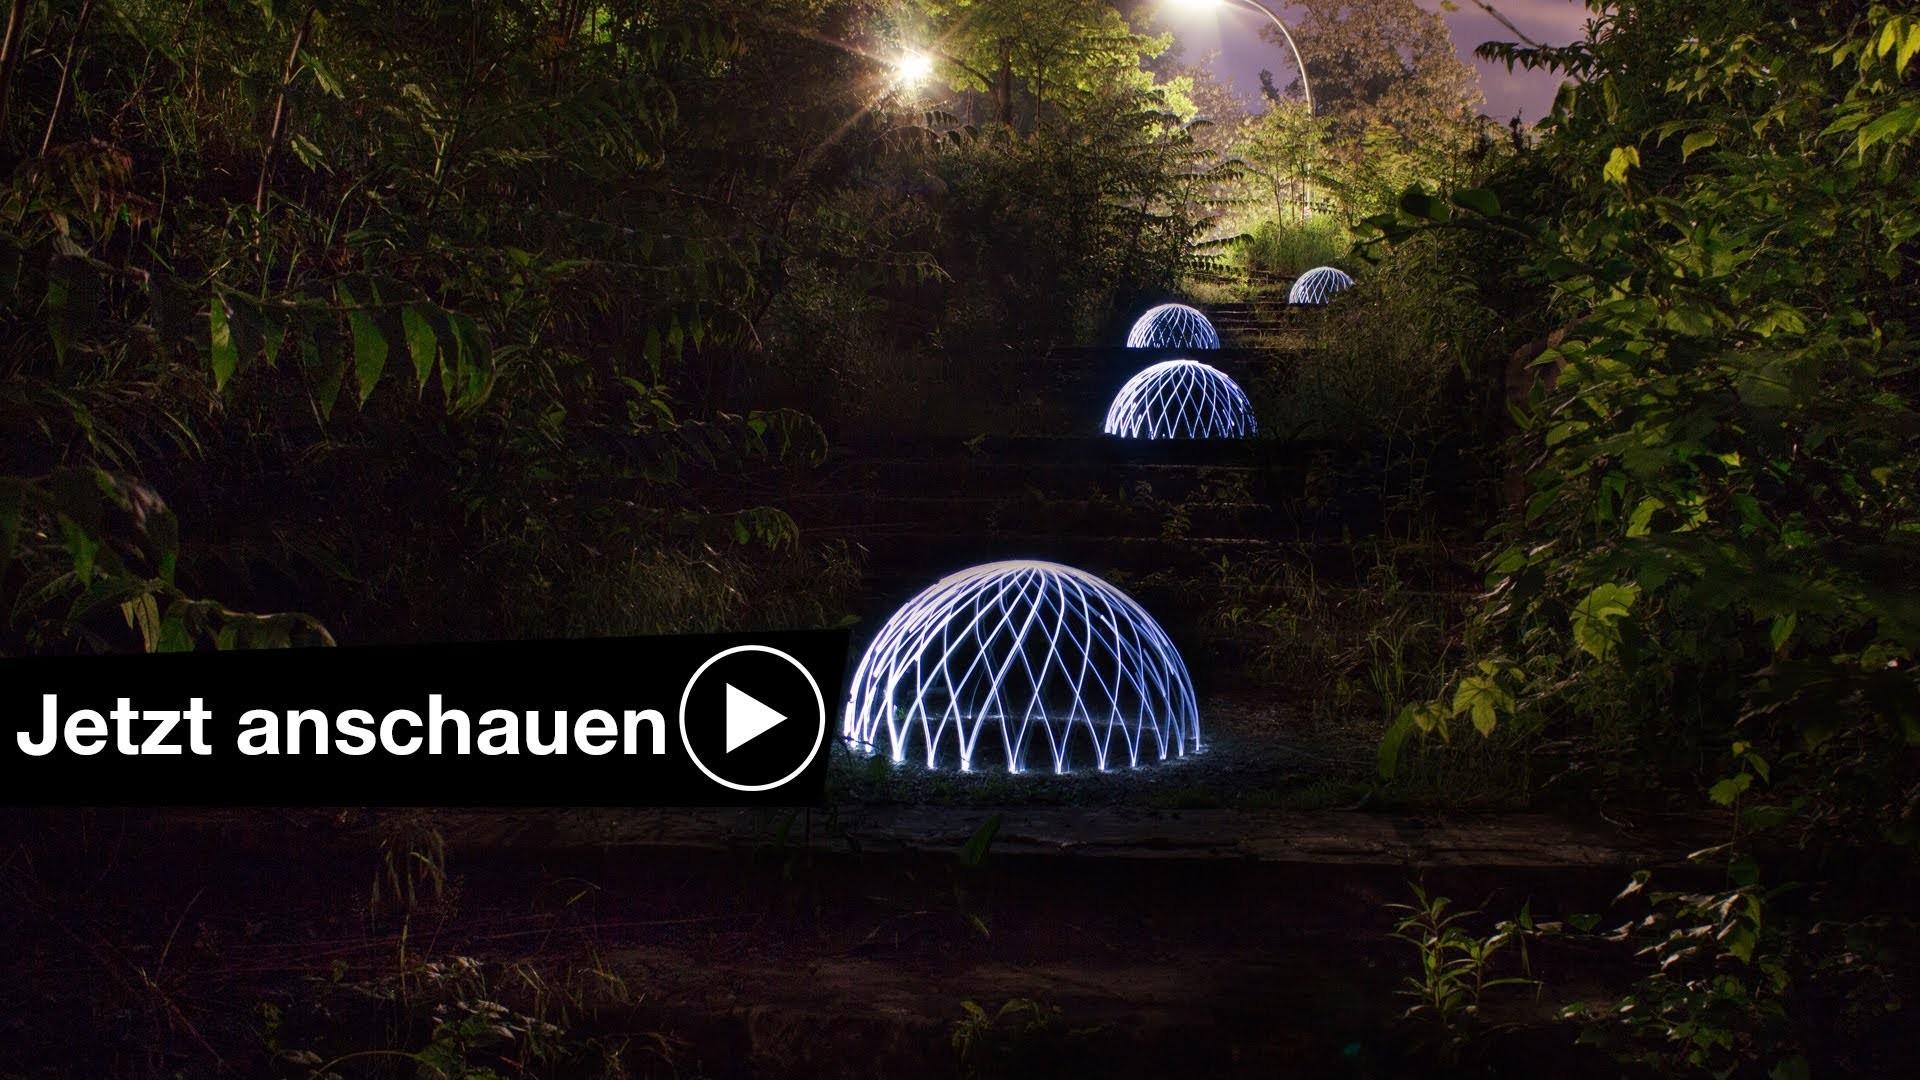 DOMES TUTORIAL - LIGHTPAINTING FOTOGRAFIEREN BEI NACHT